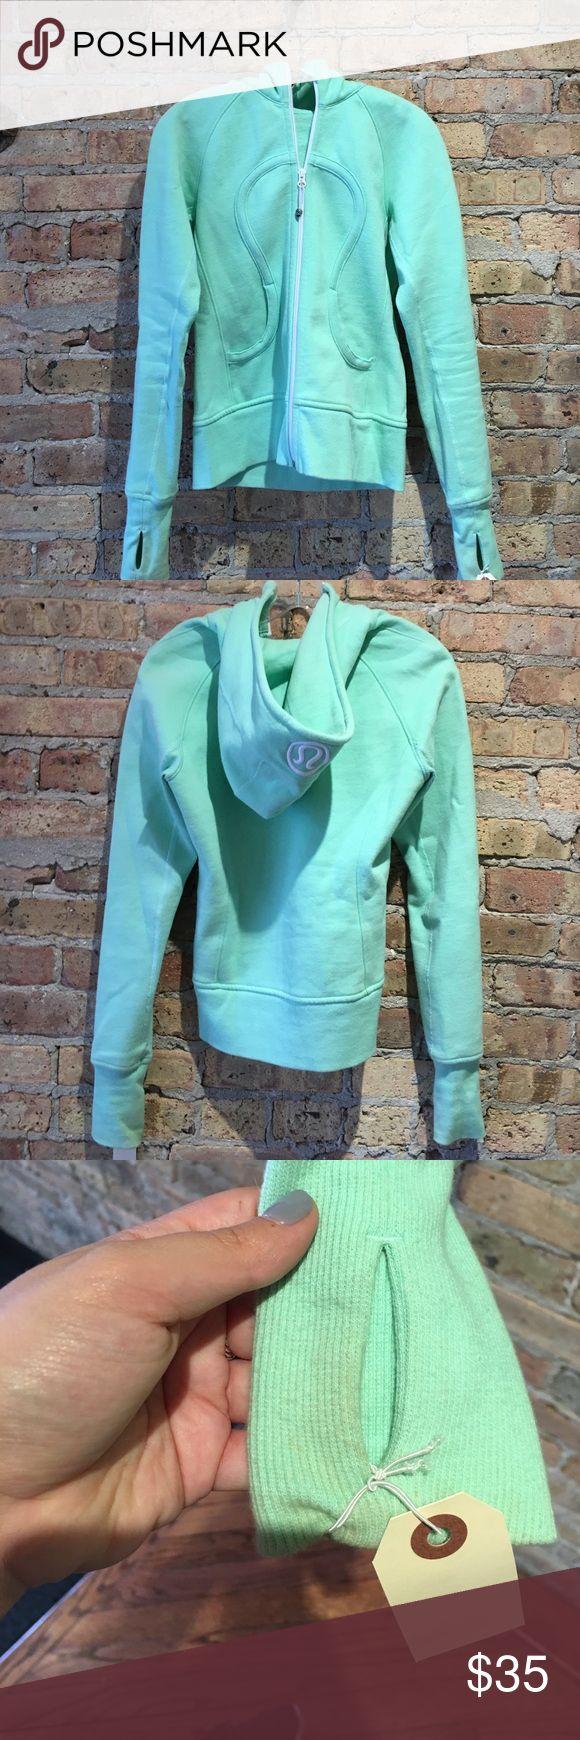 Lululemon mint green zip up size 6 Lululemon mint green zip up size 6. (52091). Small stain on sleeve, but hard to notice. Preloved good condition. lululemon athletica Tops Sweatshirts & Hoodies